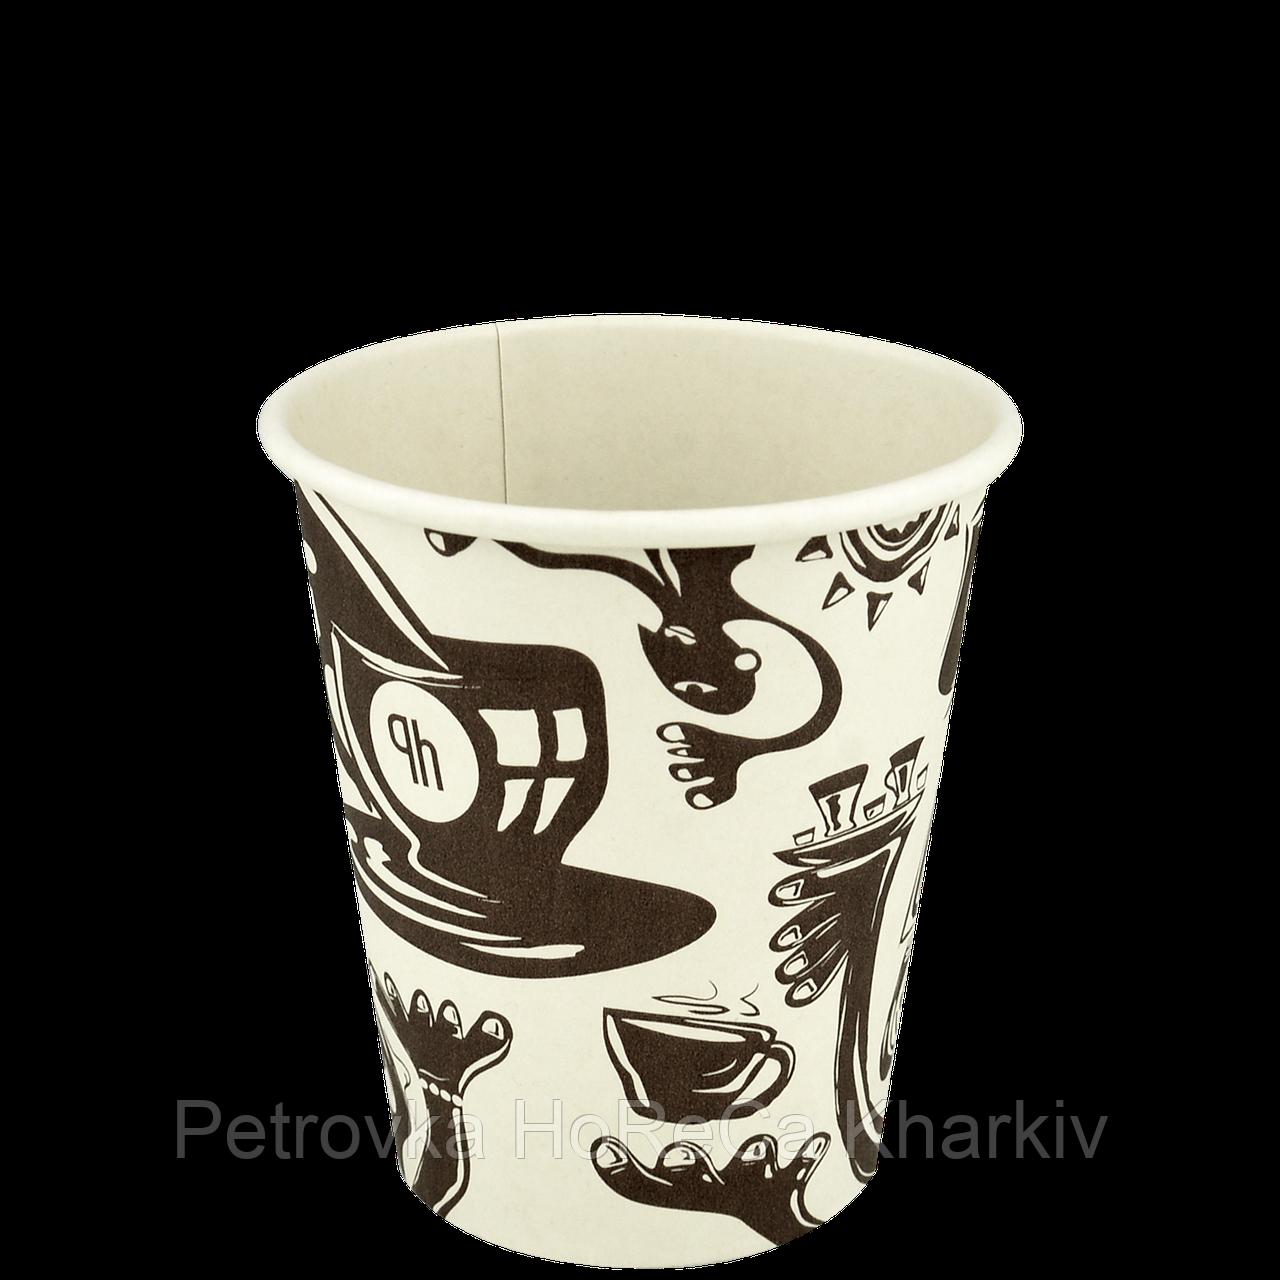 "Одноразовый стакан, серия Afrika bamboo, 350мл. Евро, 50шт/уп (1ящ/20уп/1000шт) под крышку FiB90/""РОМБ"""